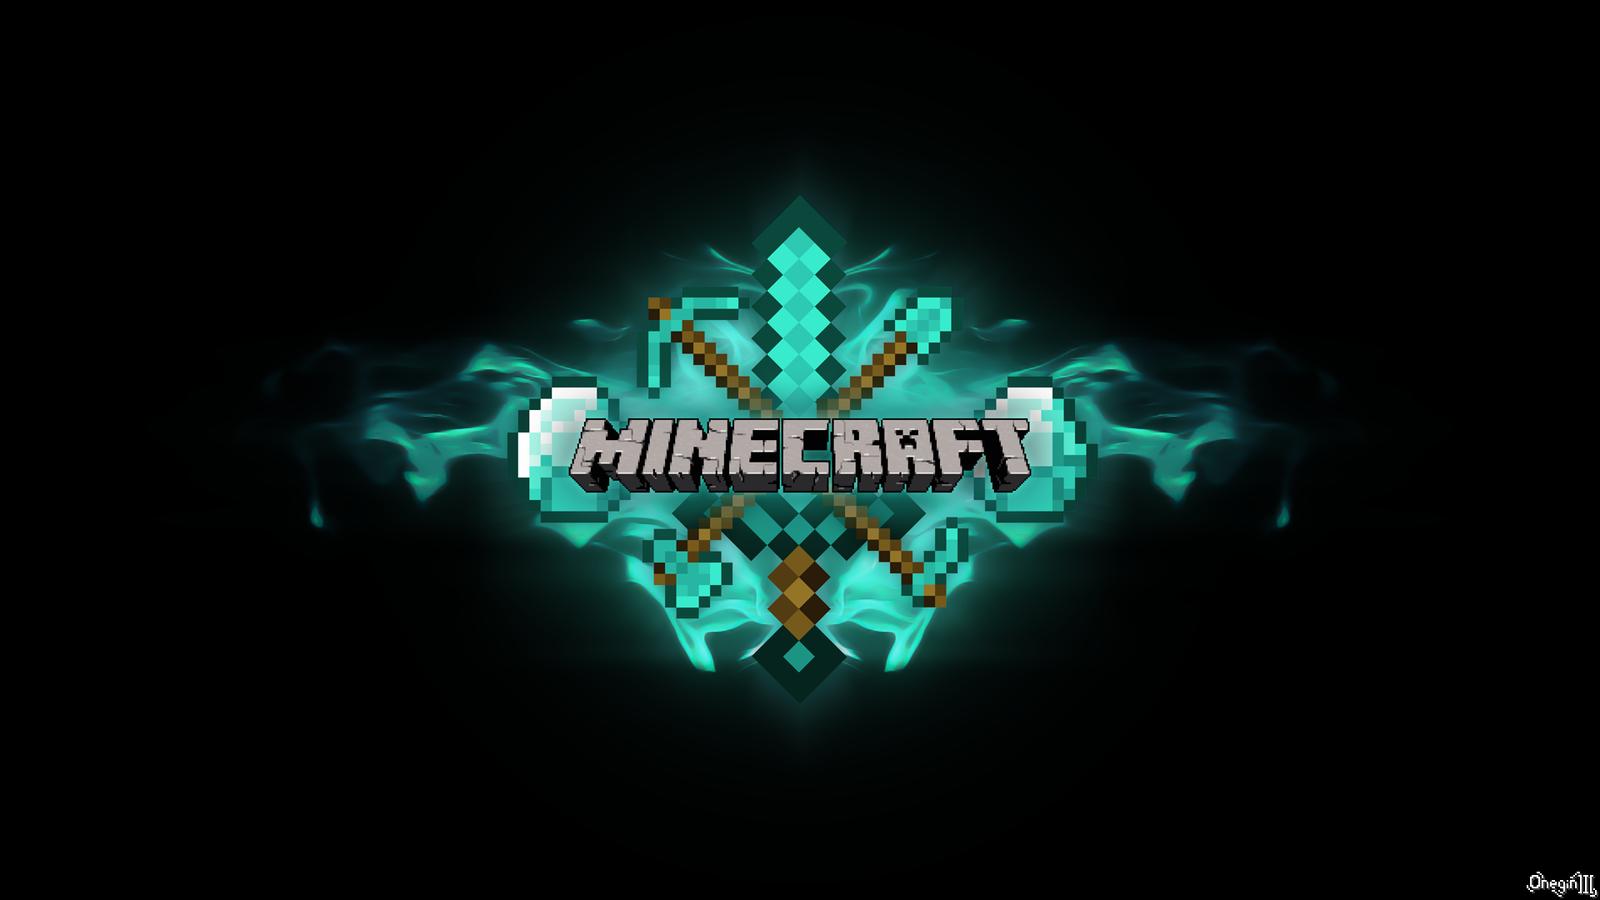 Minecraft Wallpaper Diamond Pickaxe images 1600x900